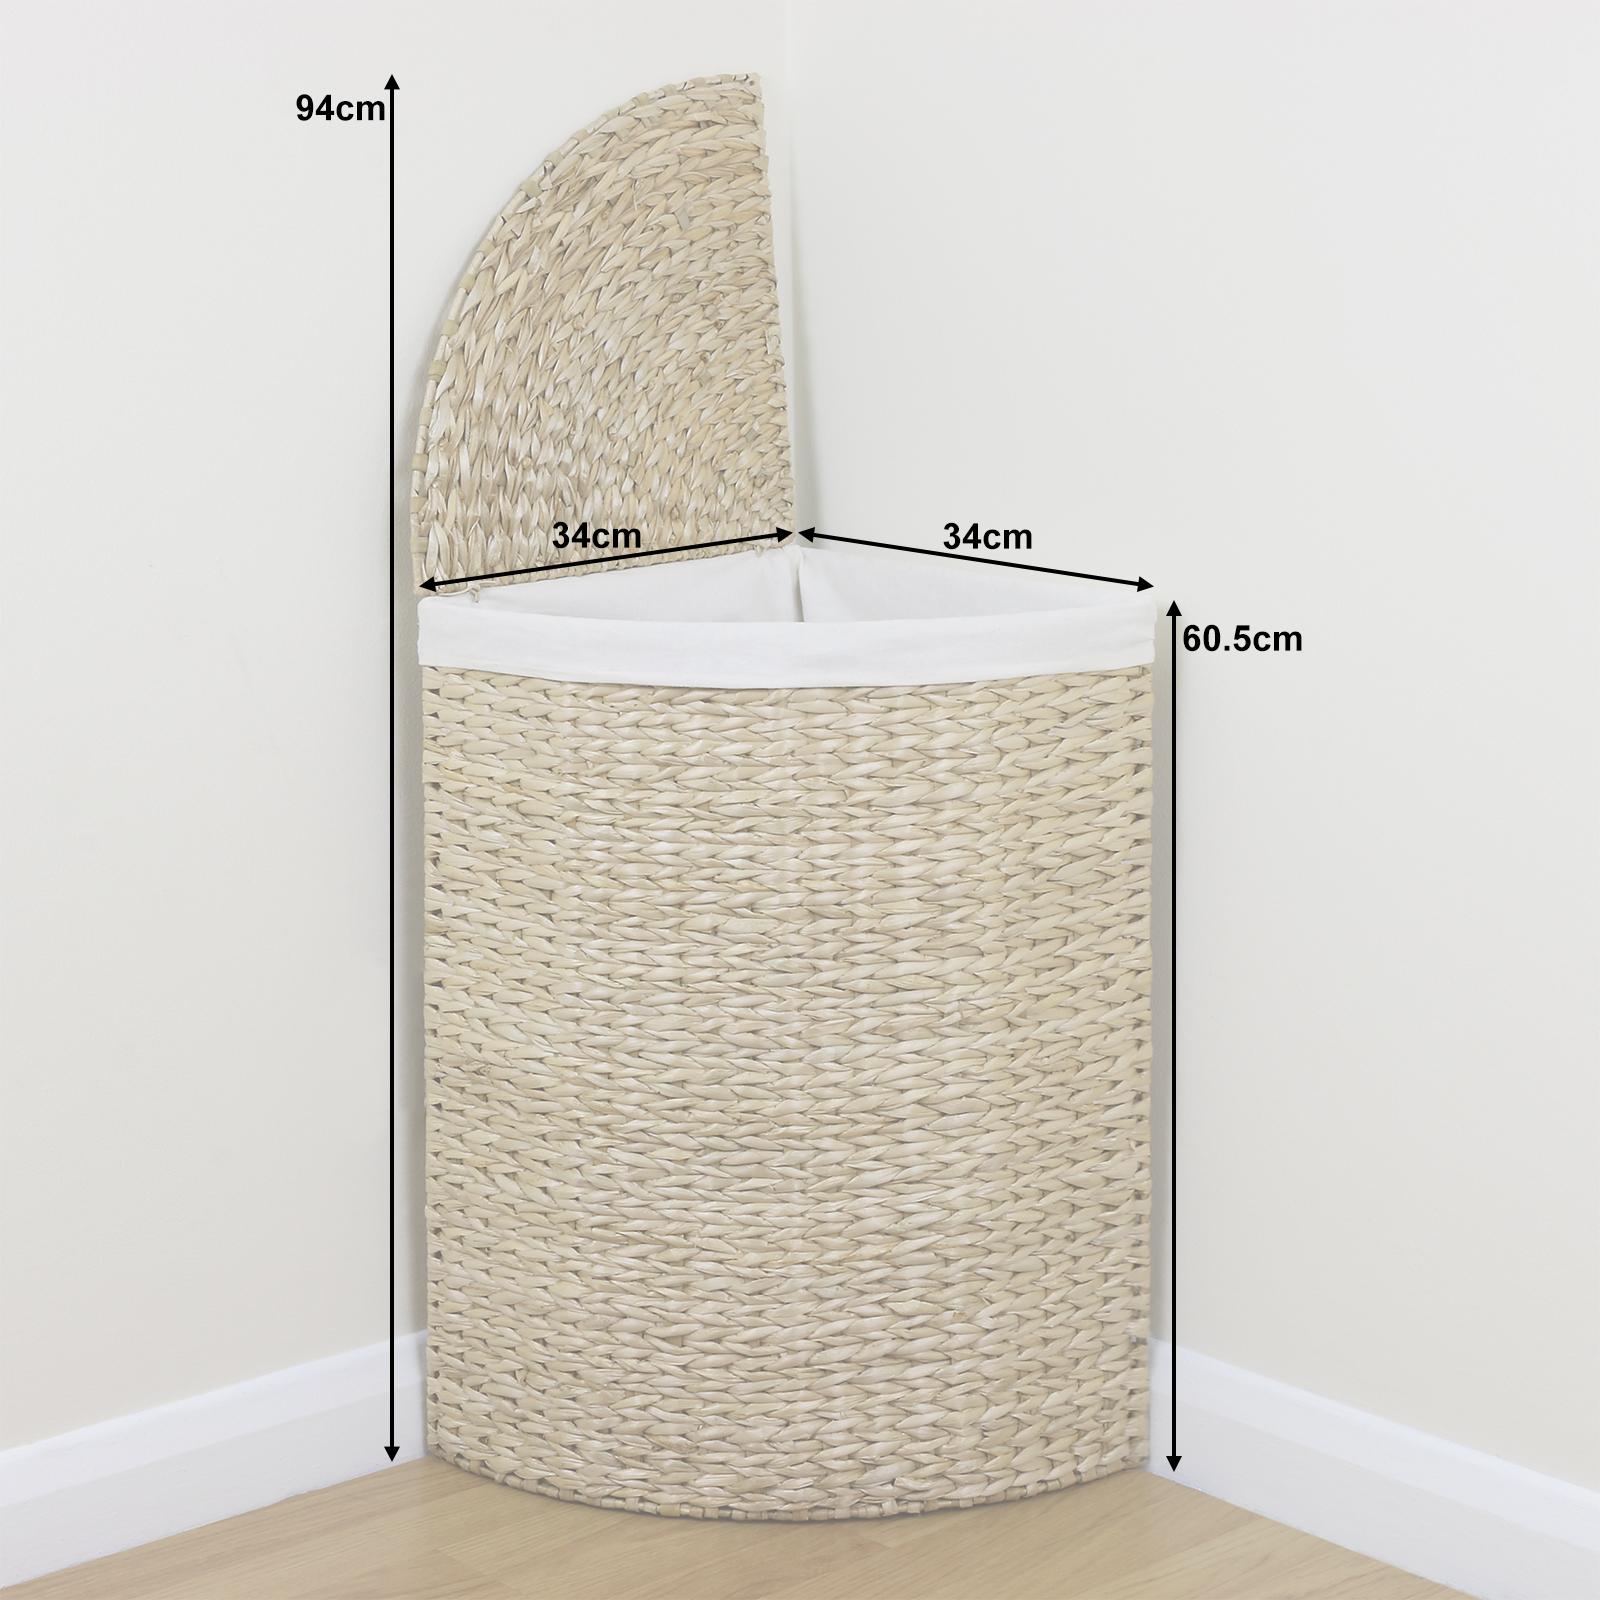 Corner Woven Laundry Basket Cloth Lining Lid Hamper Bin Wicker Washing Storage Ebay